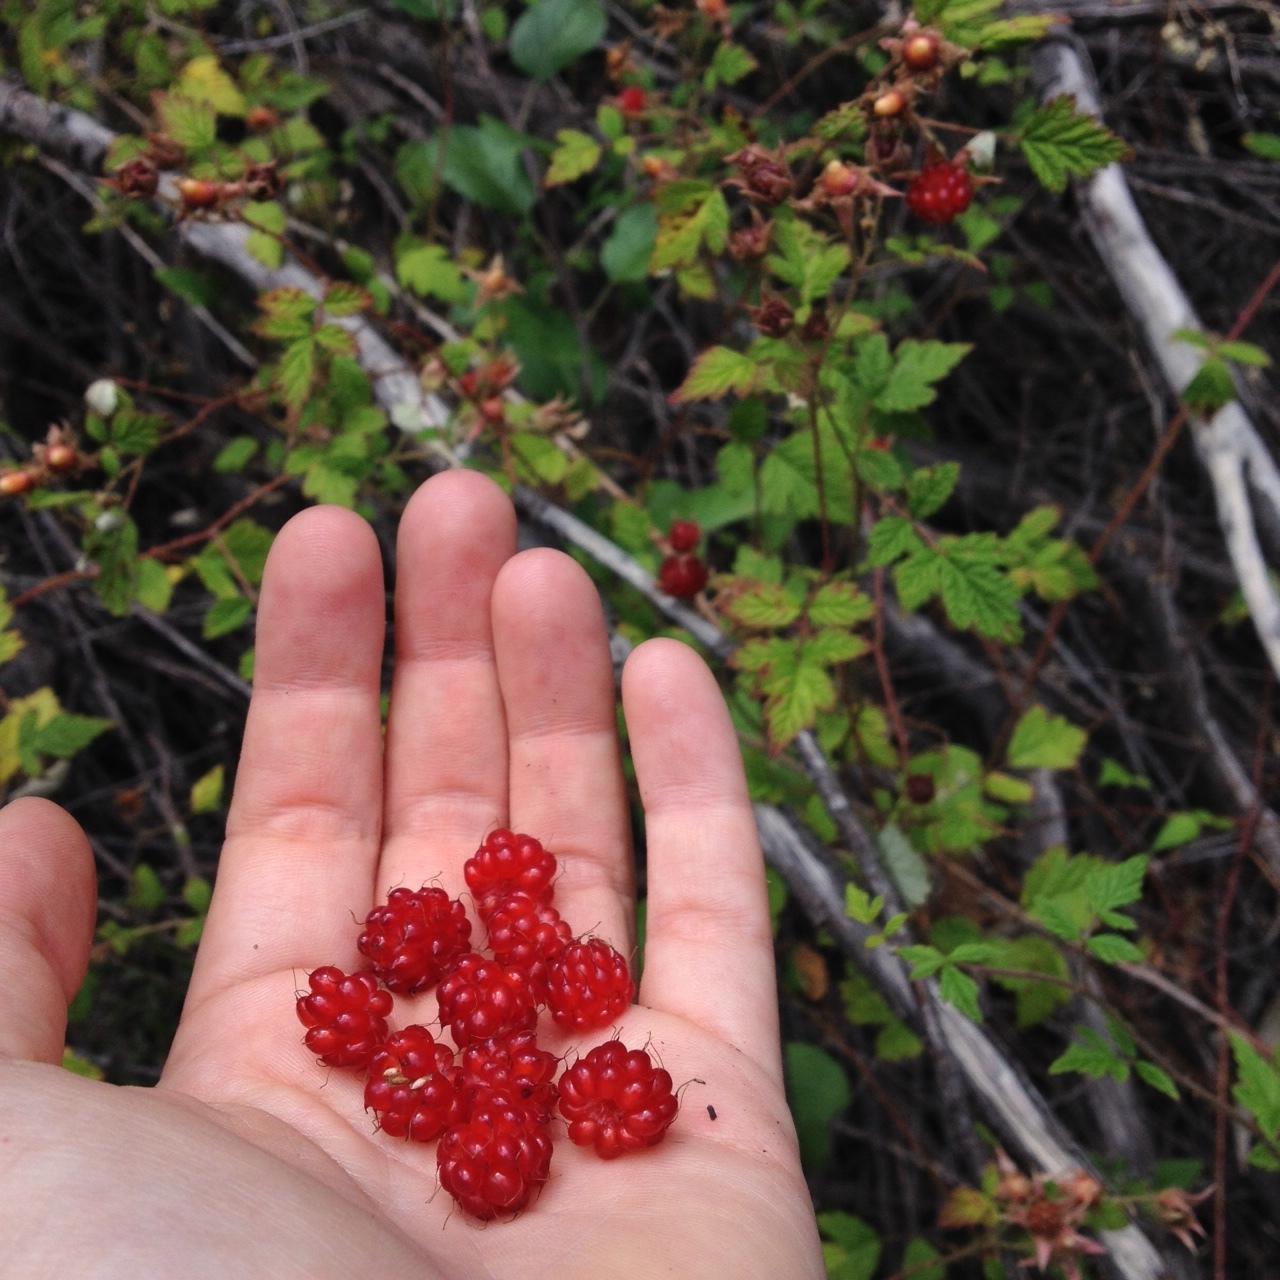 Native rasberries. Photo: Fam Charko.